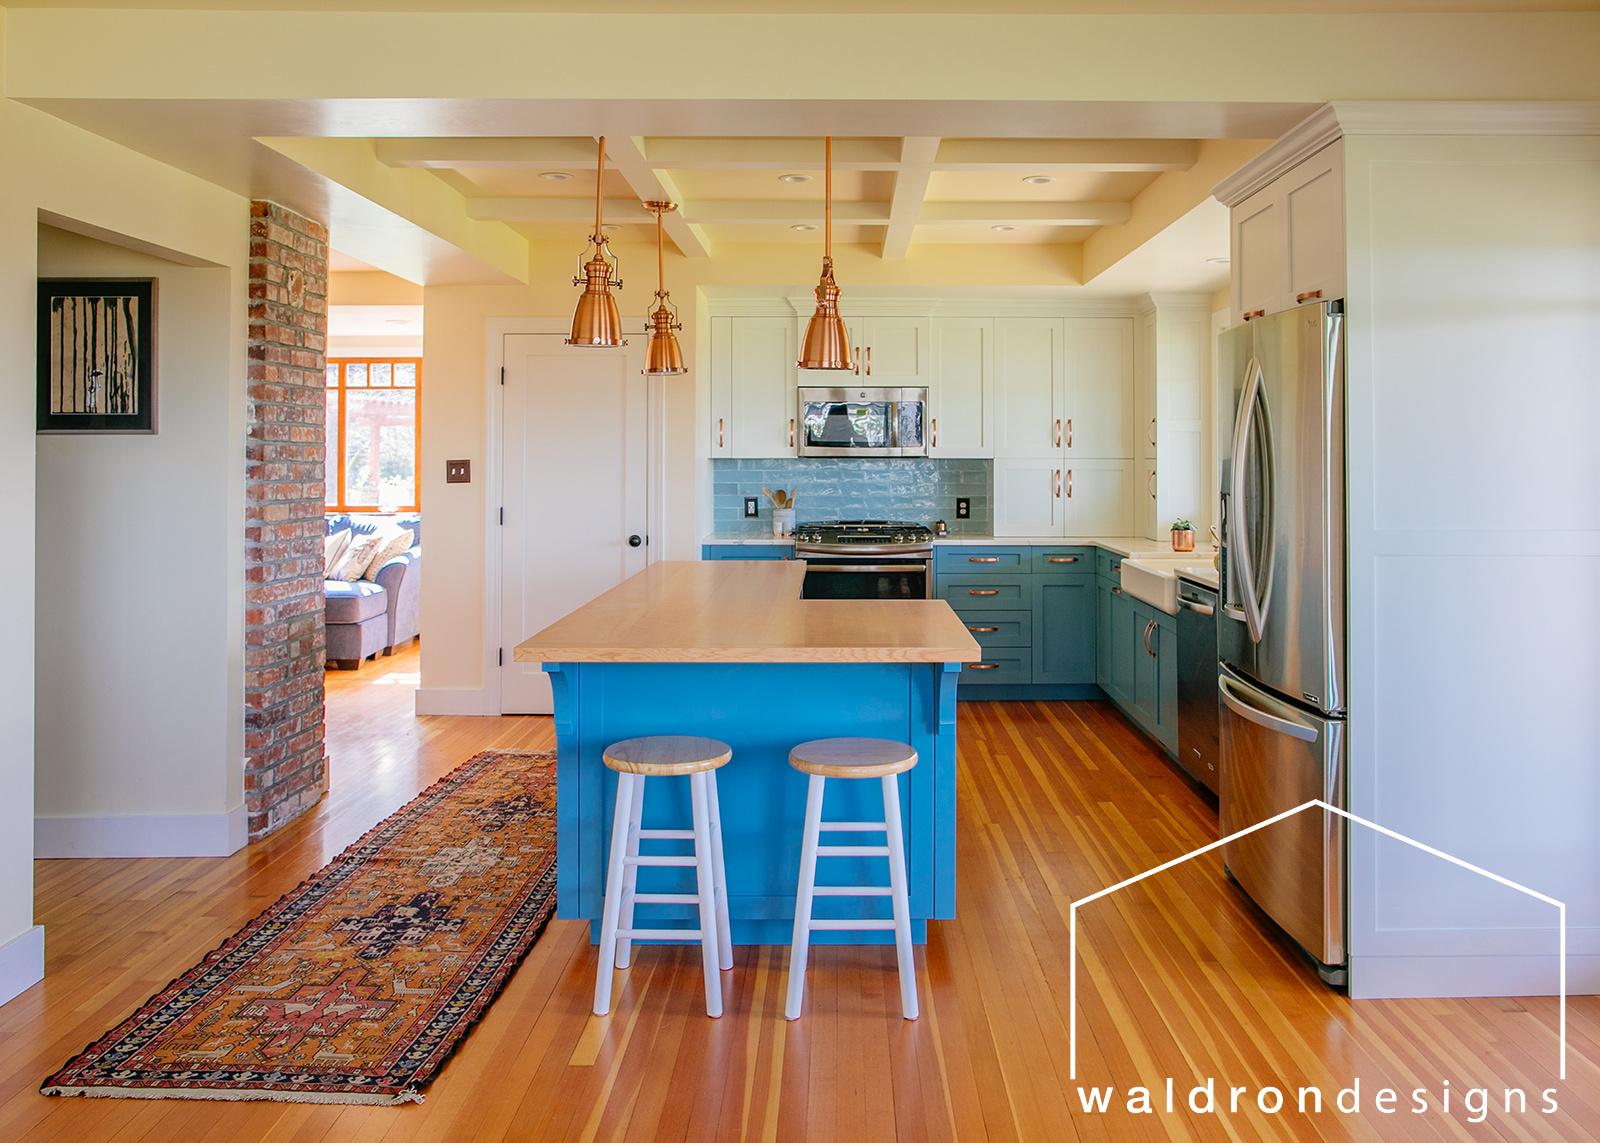 white-and-blue-kitchen-copper-wood-floors-vashon-seattle-tacoma-interior-designer-waldron-designs.jpg